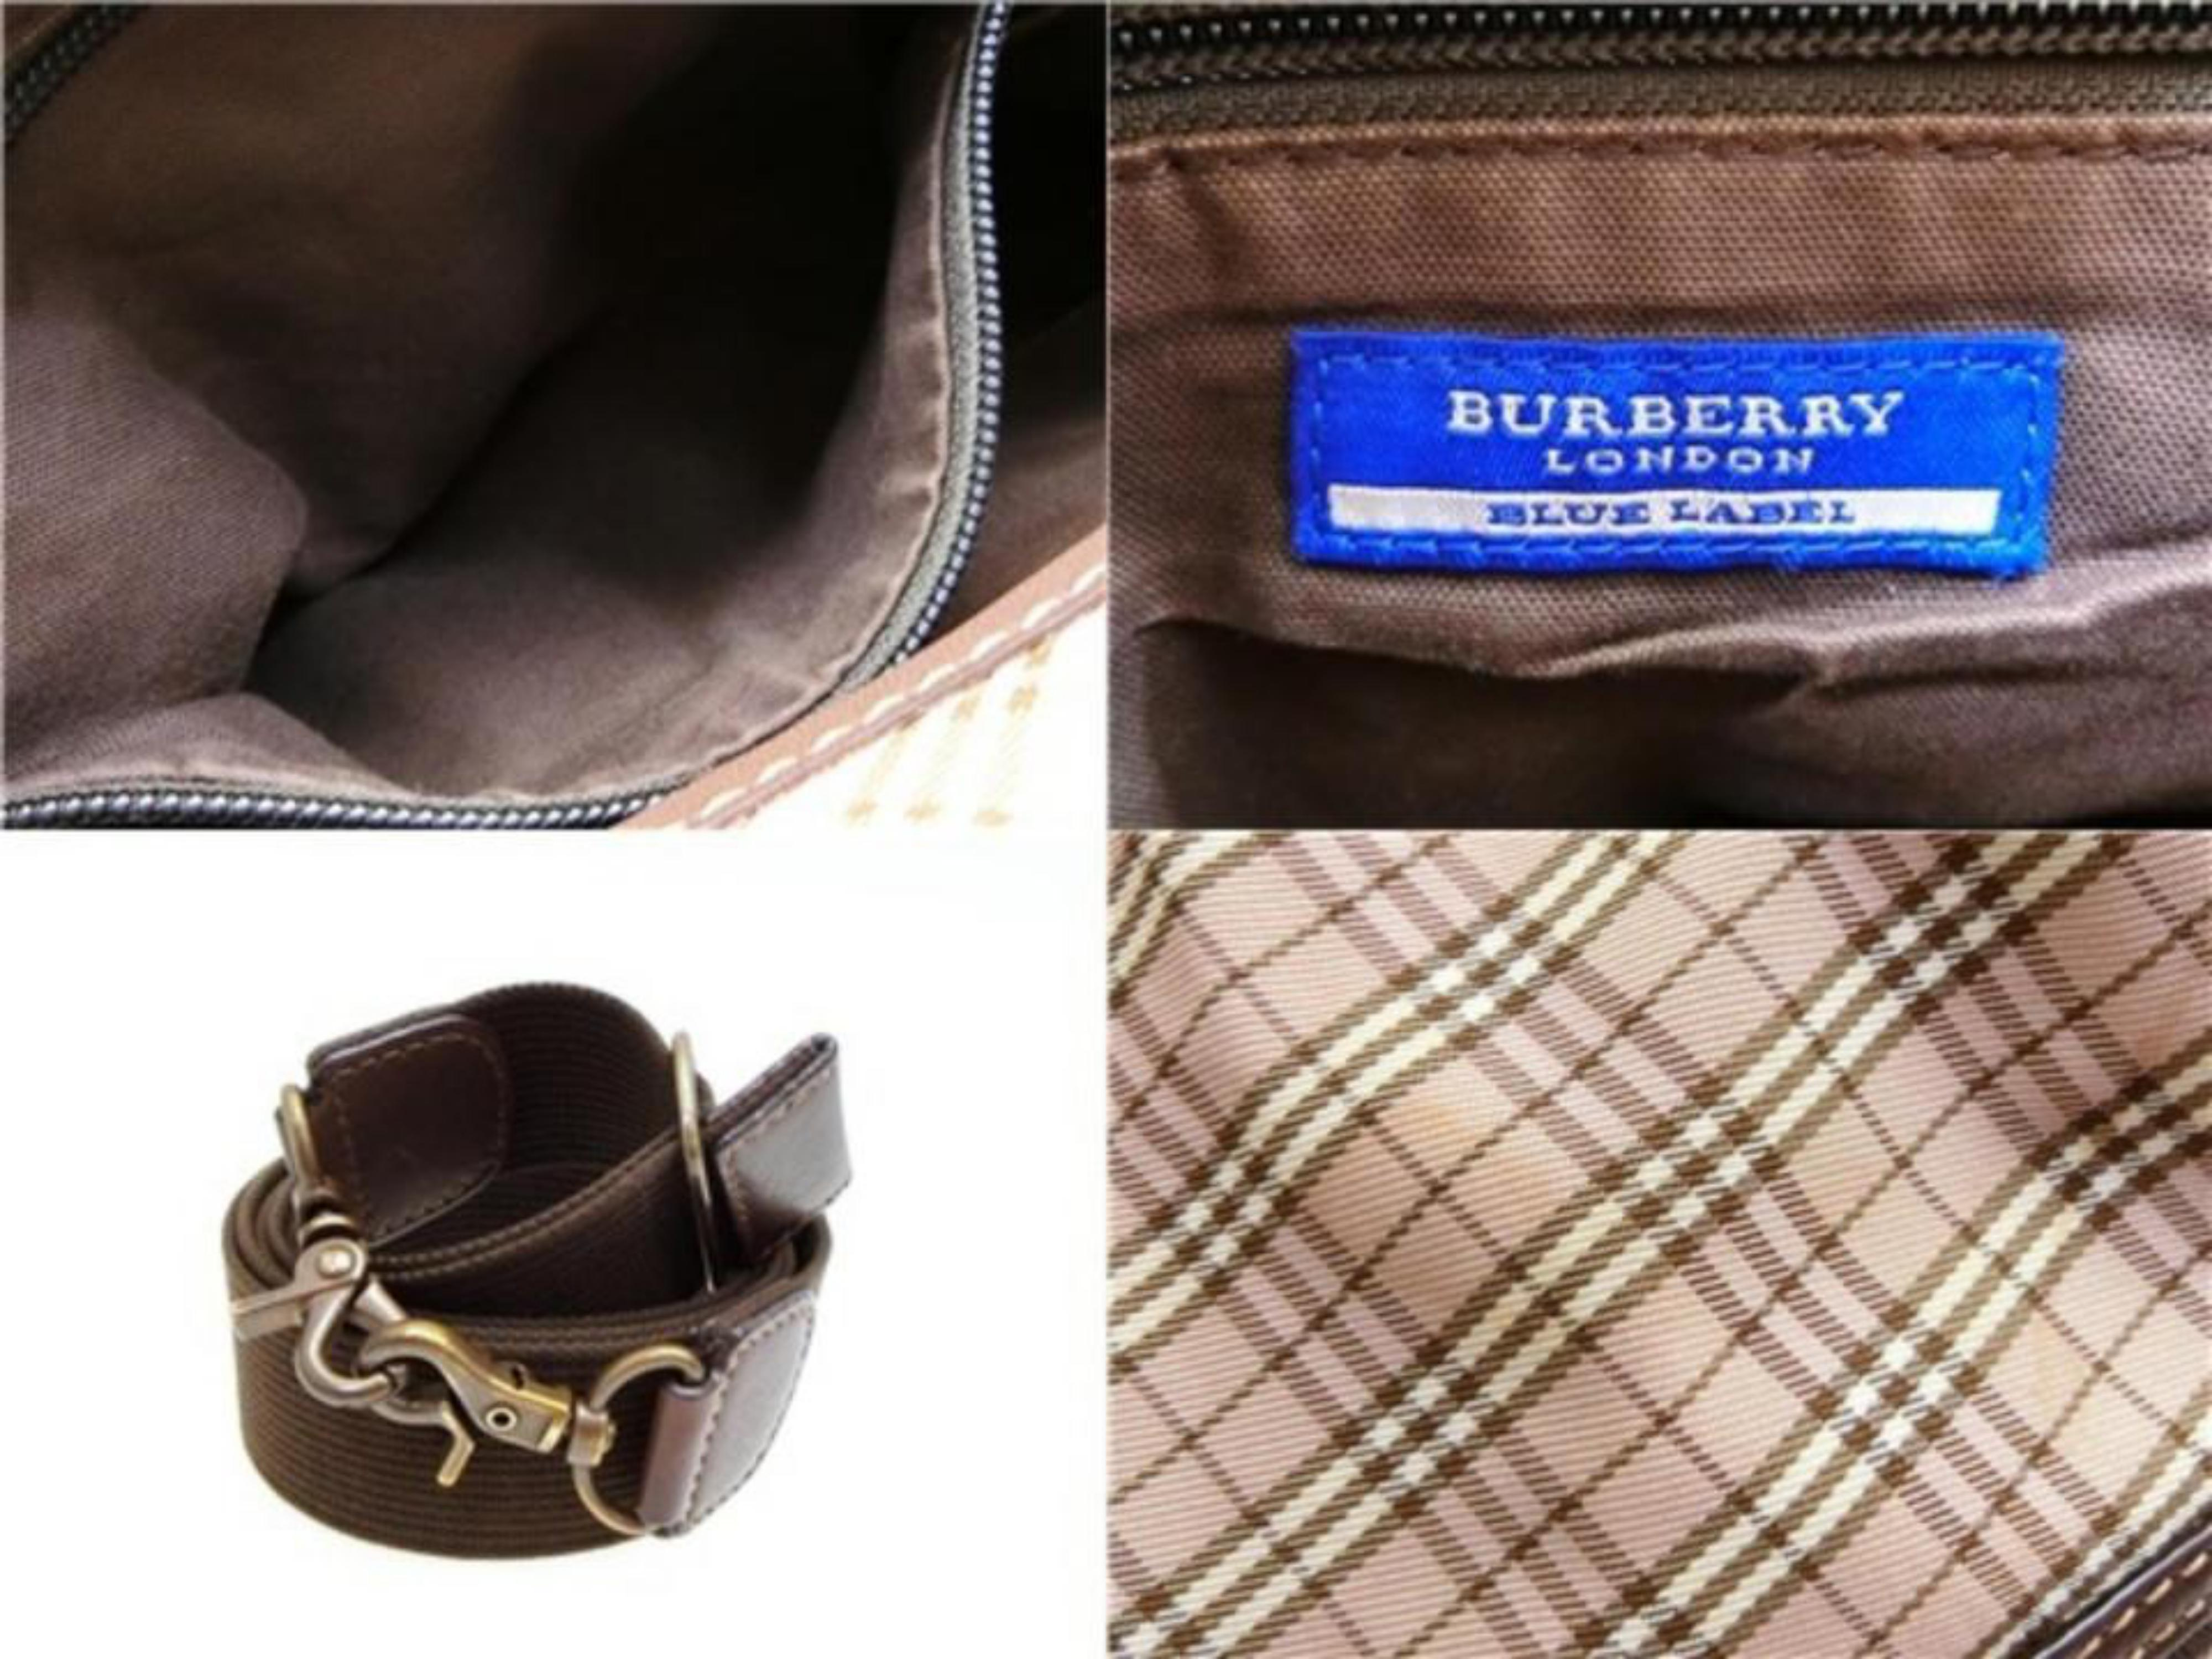 1ce15a84c93d Burberry Blue Label Nova Check 2way Flap 232549 Brown Canvas Satchel For  Sale at 1stdibs